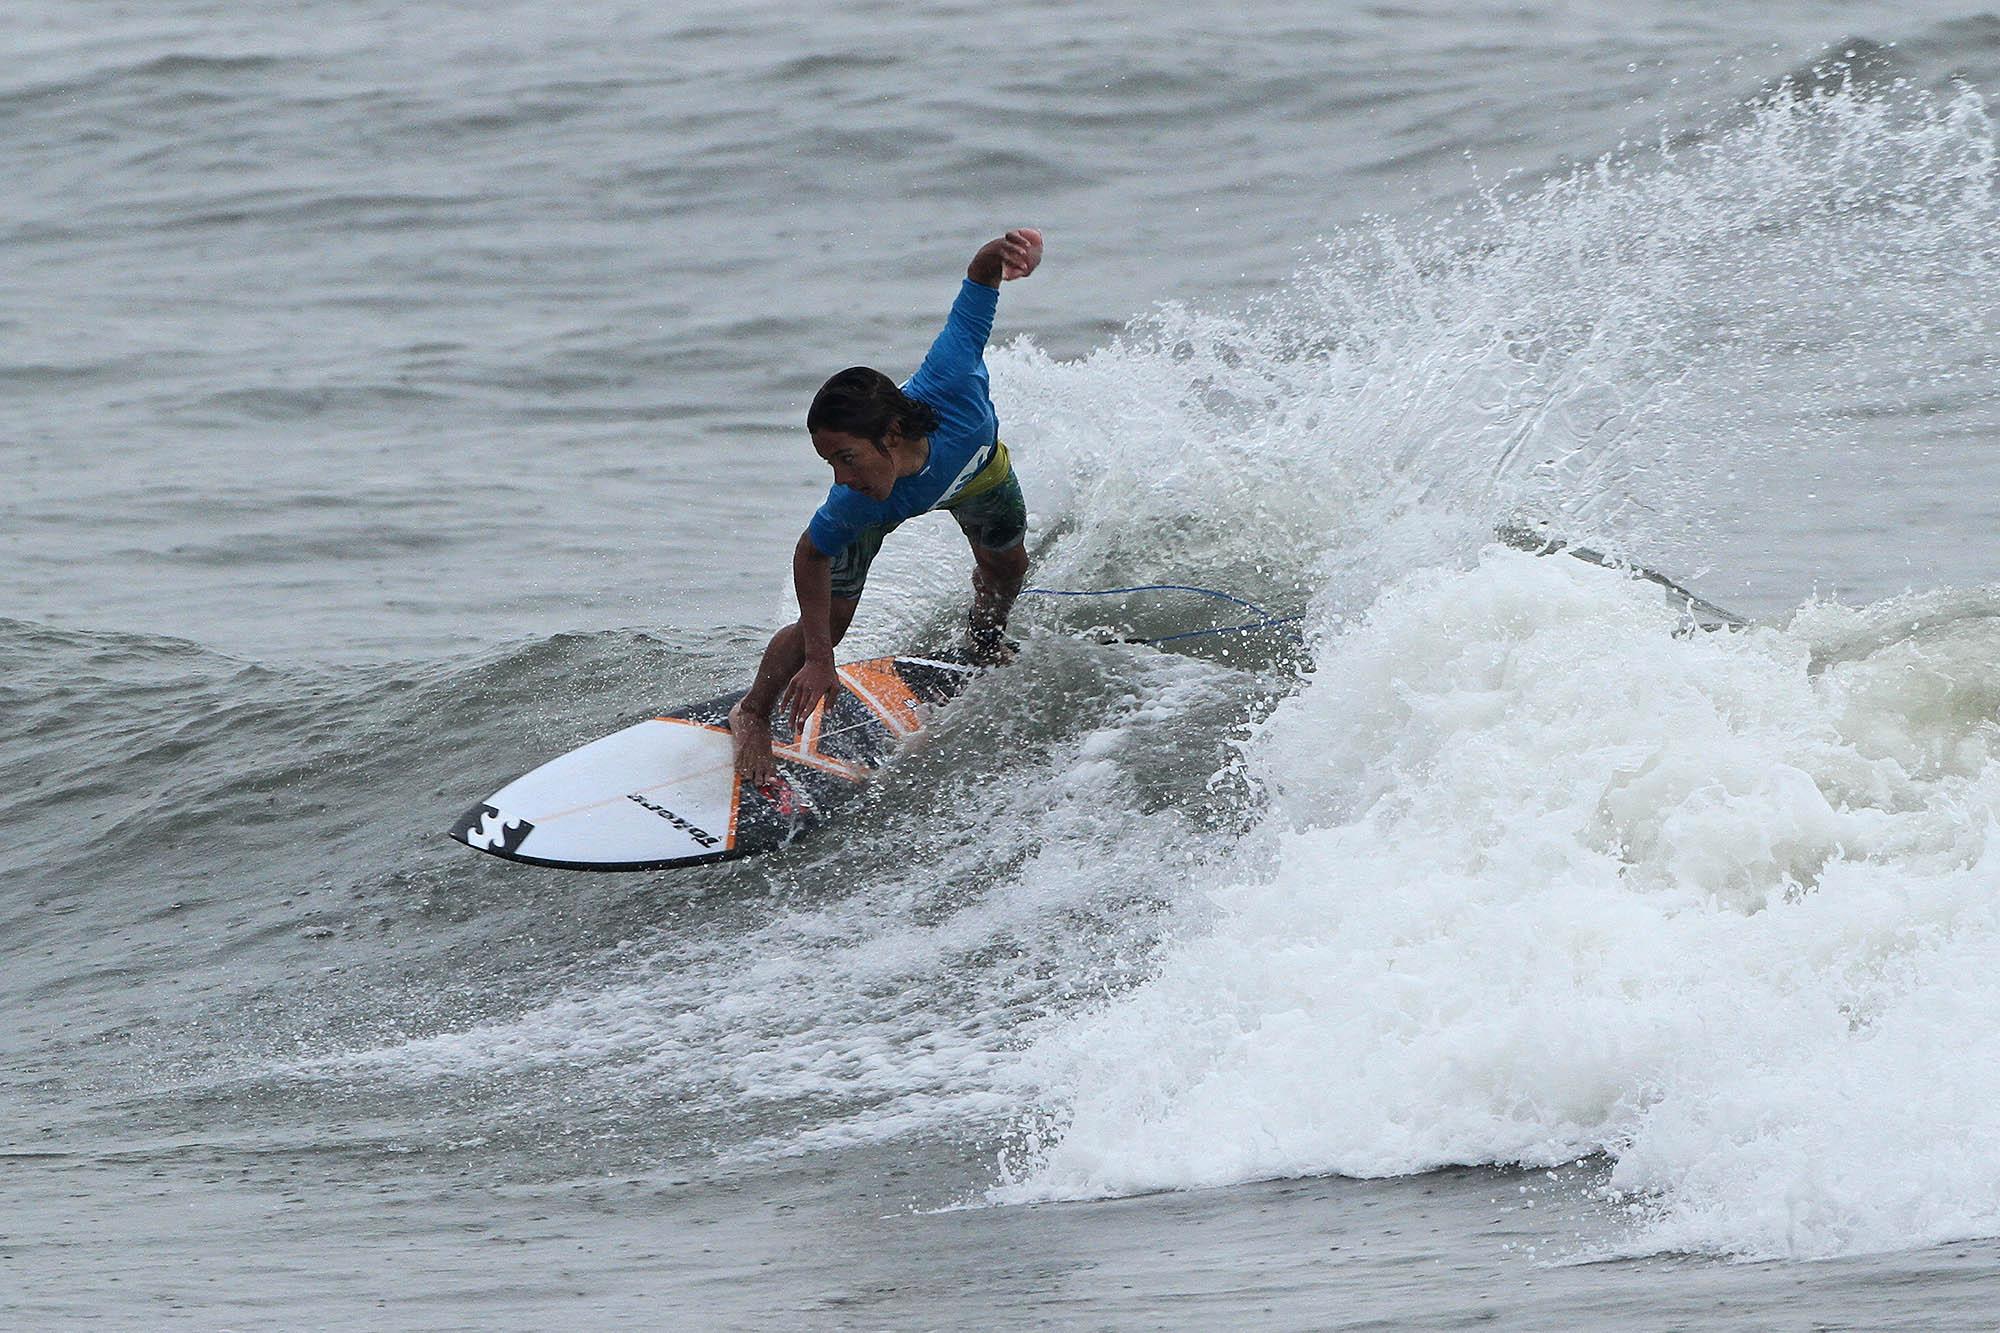 Lucas Vicente na abertura do Hang Loose Surf Attack / Foto Munir El Hage